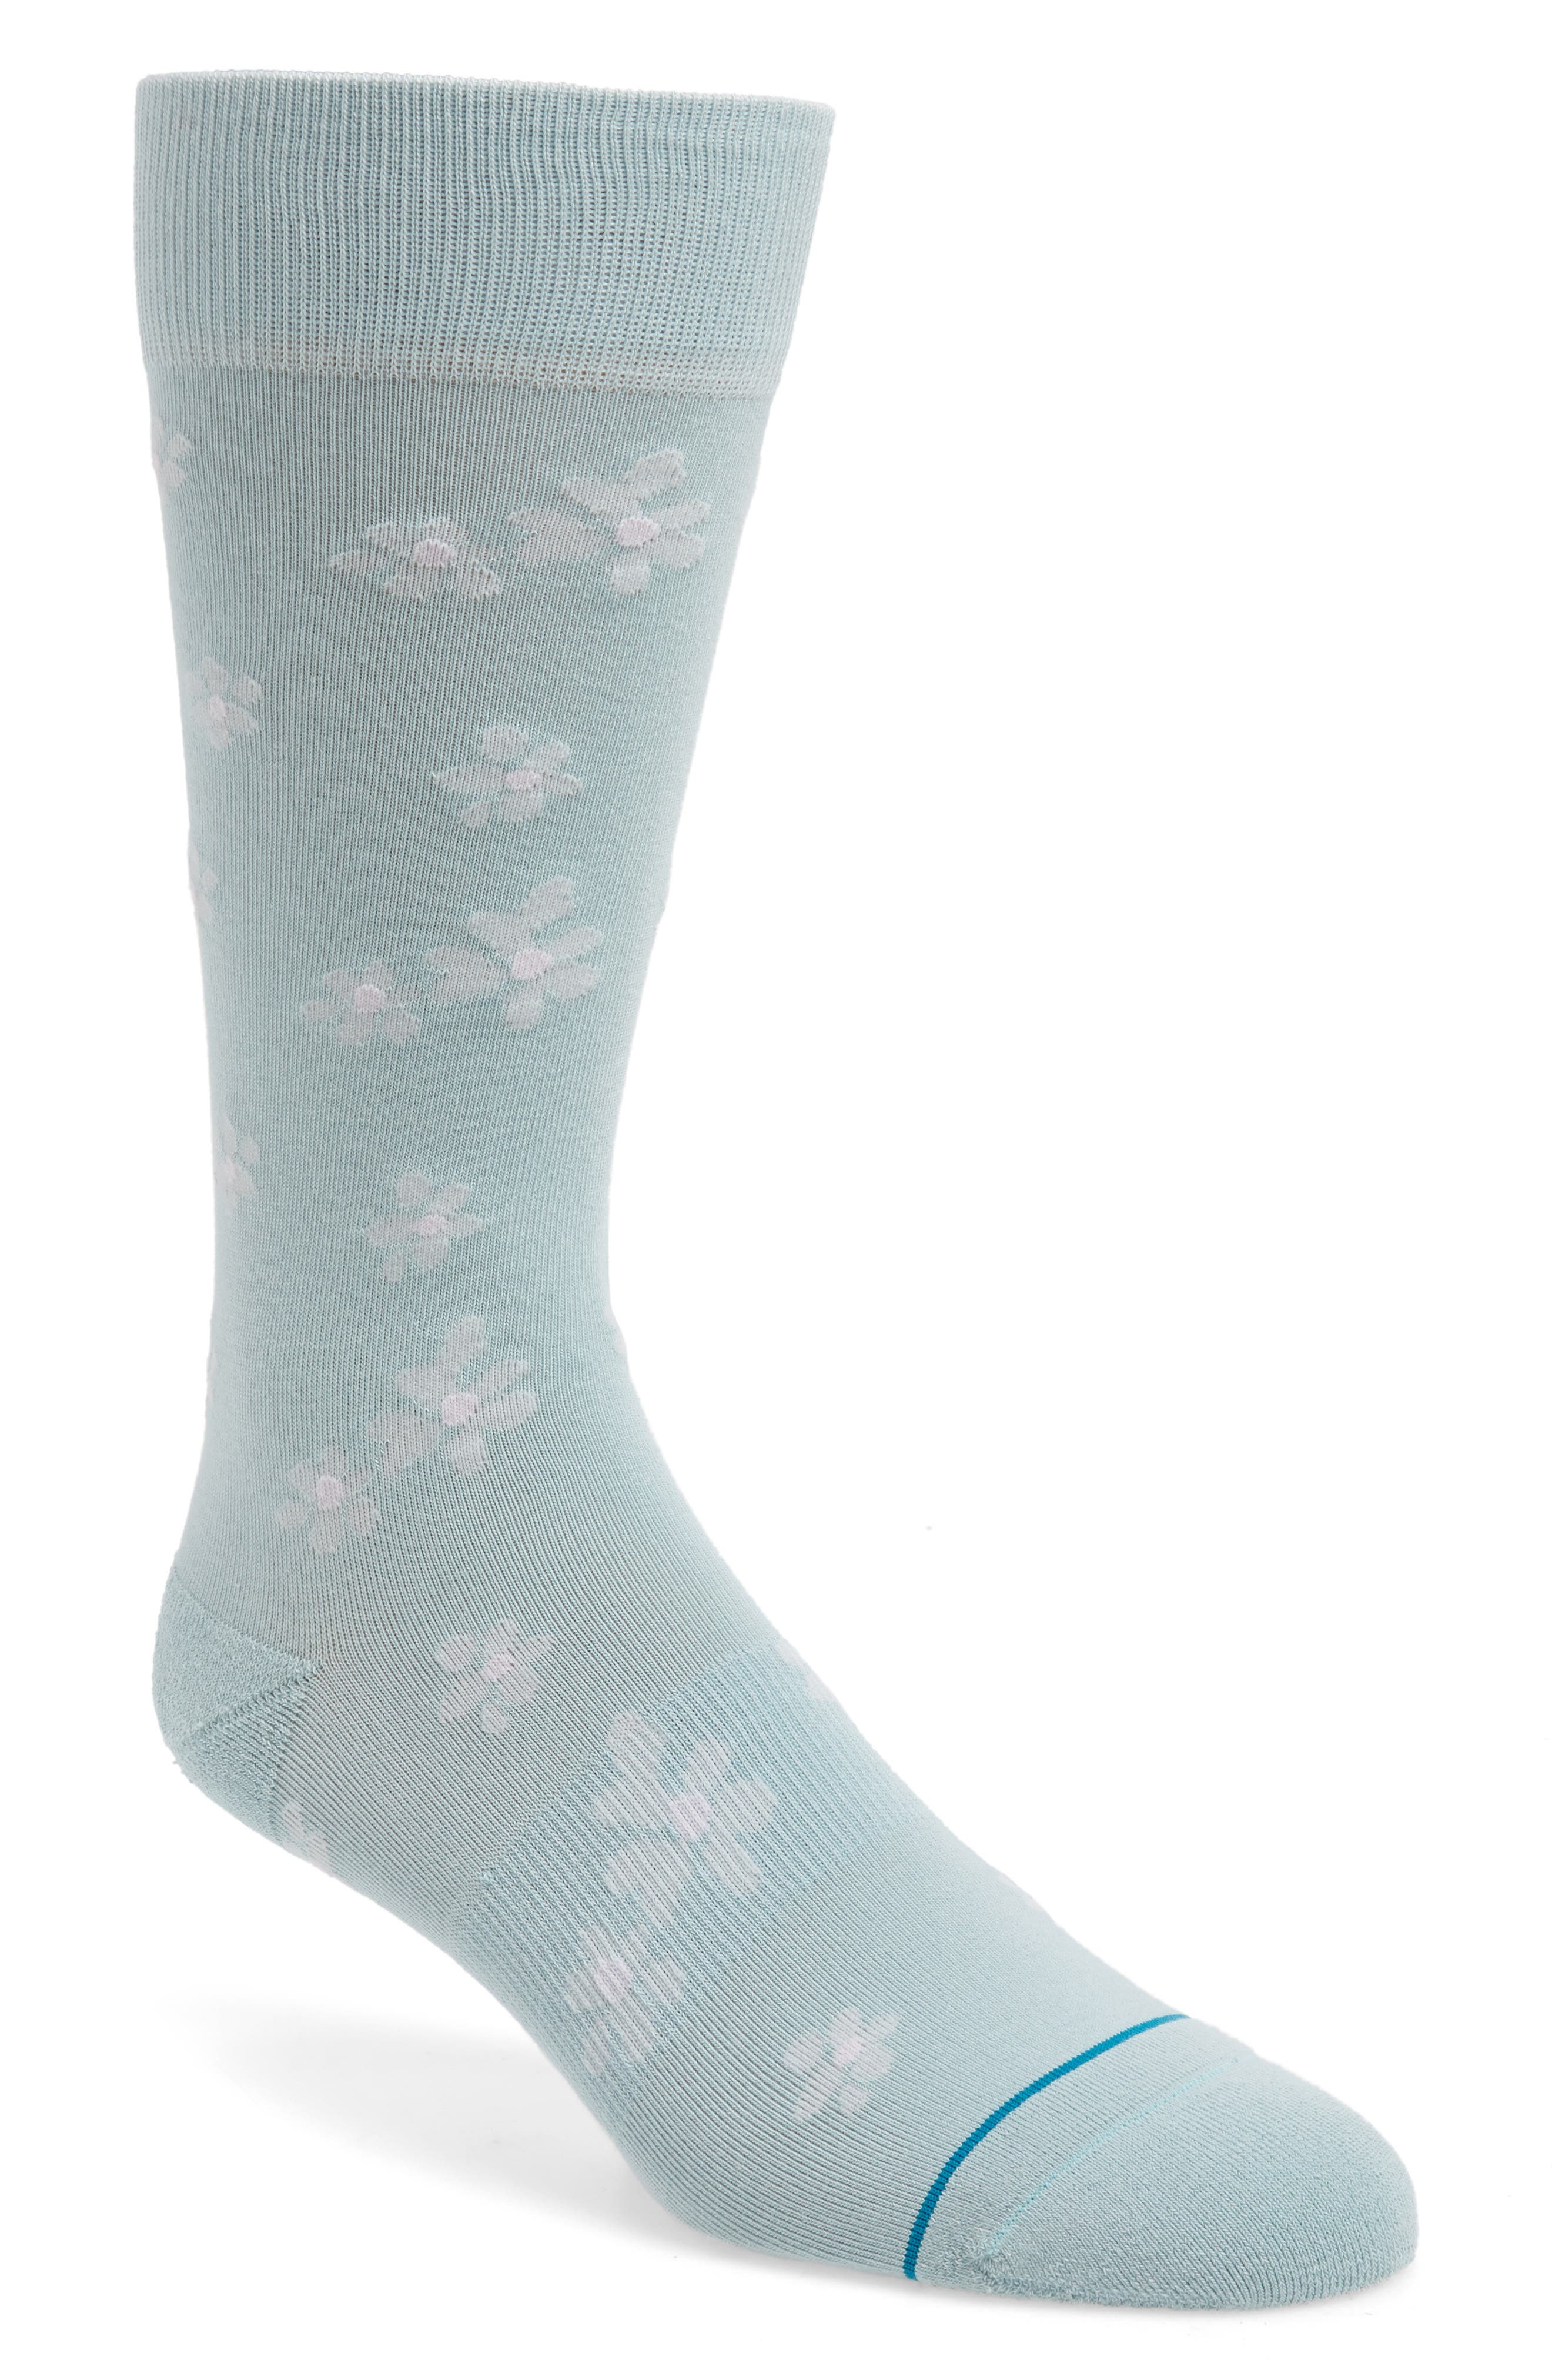 Dillon Socks,                         Main,                         color, BLUE